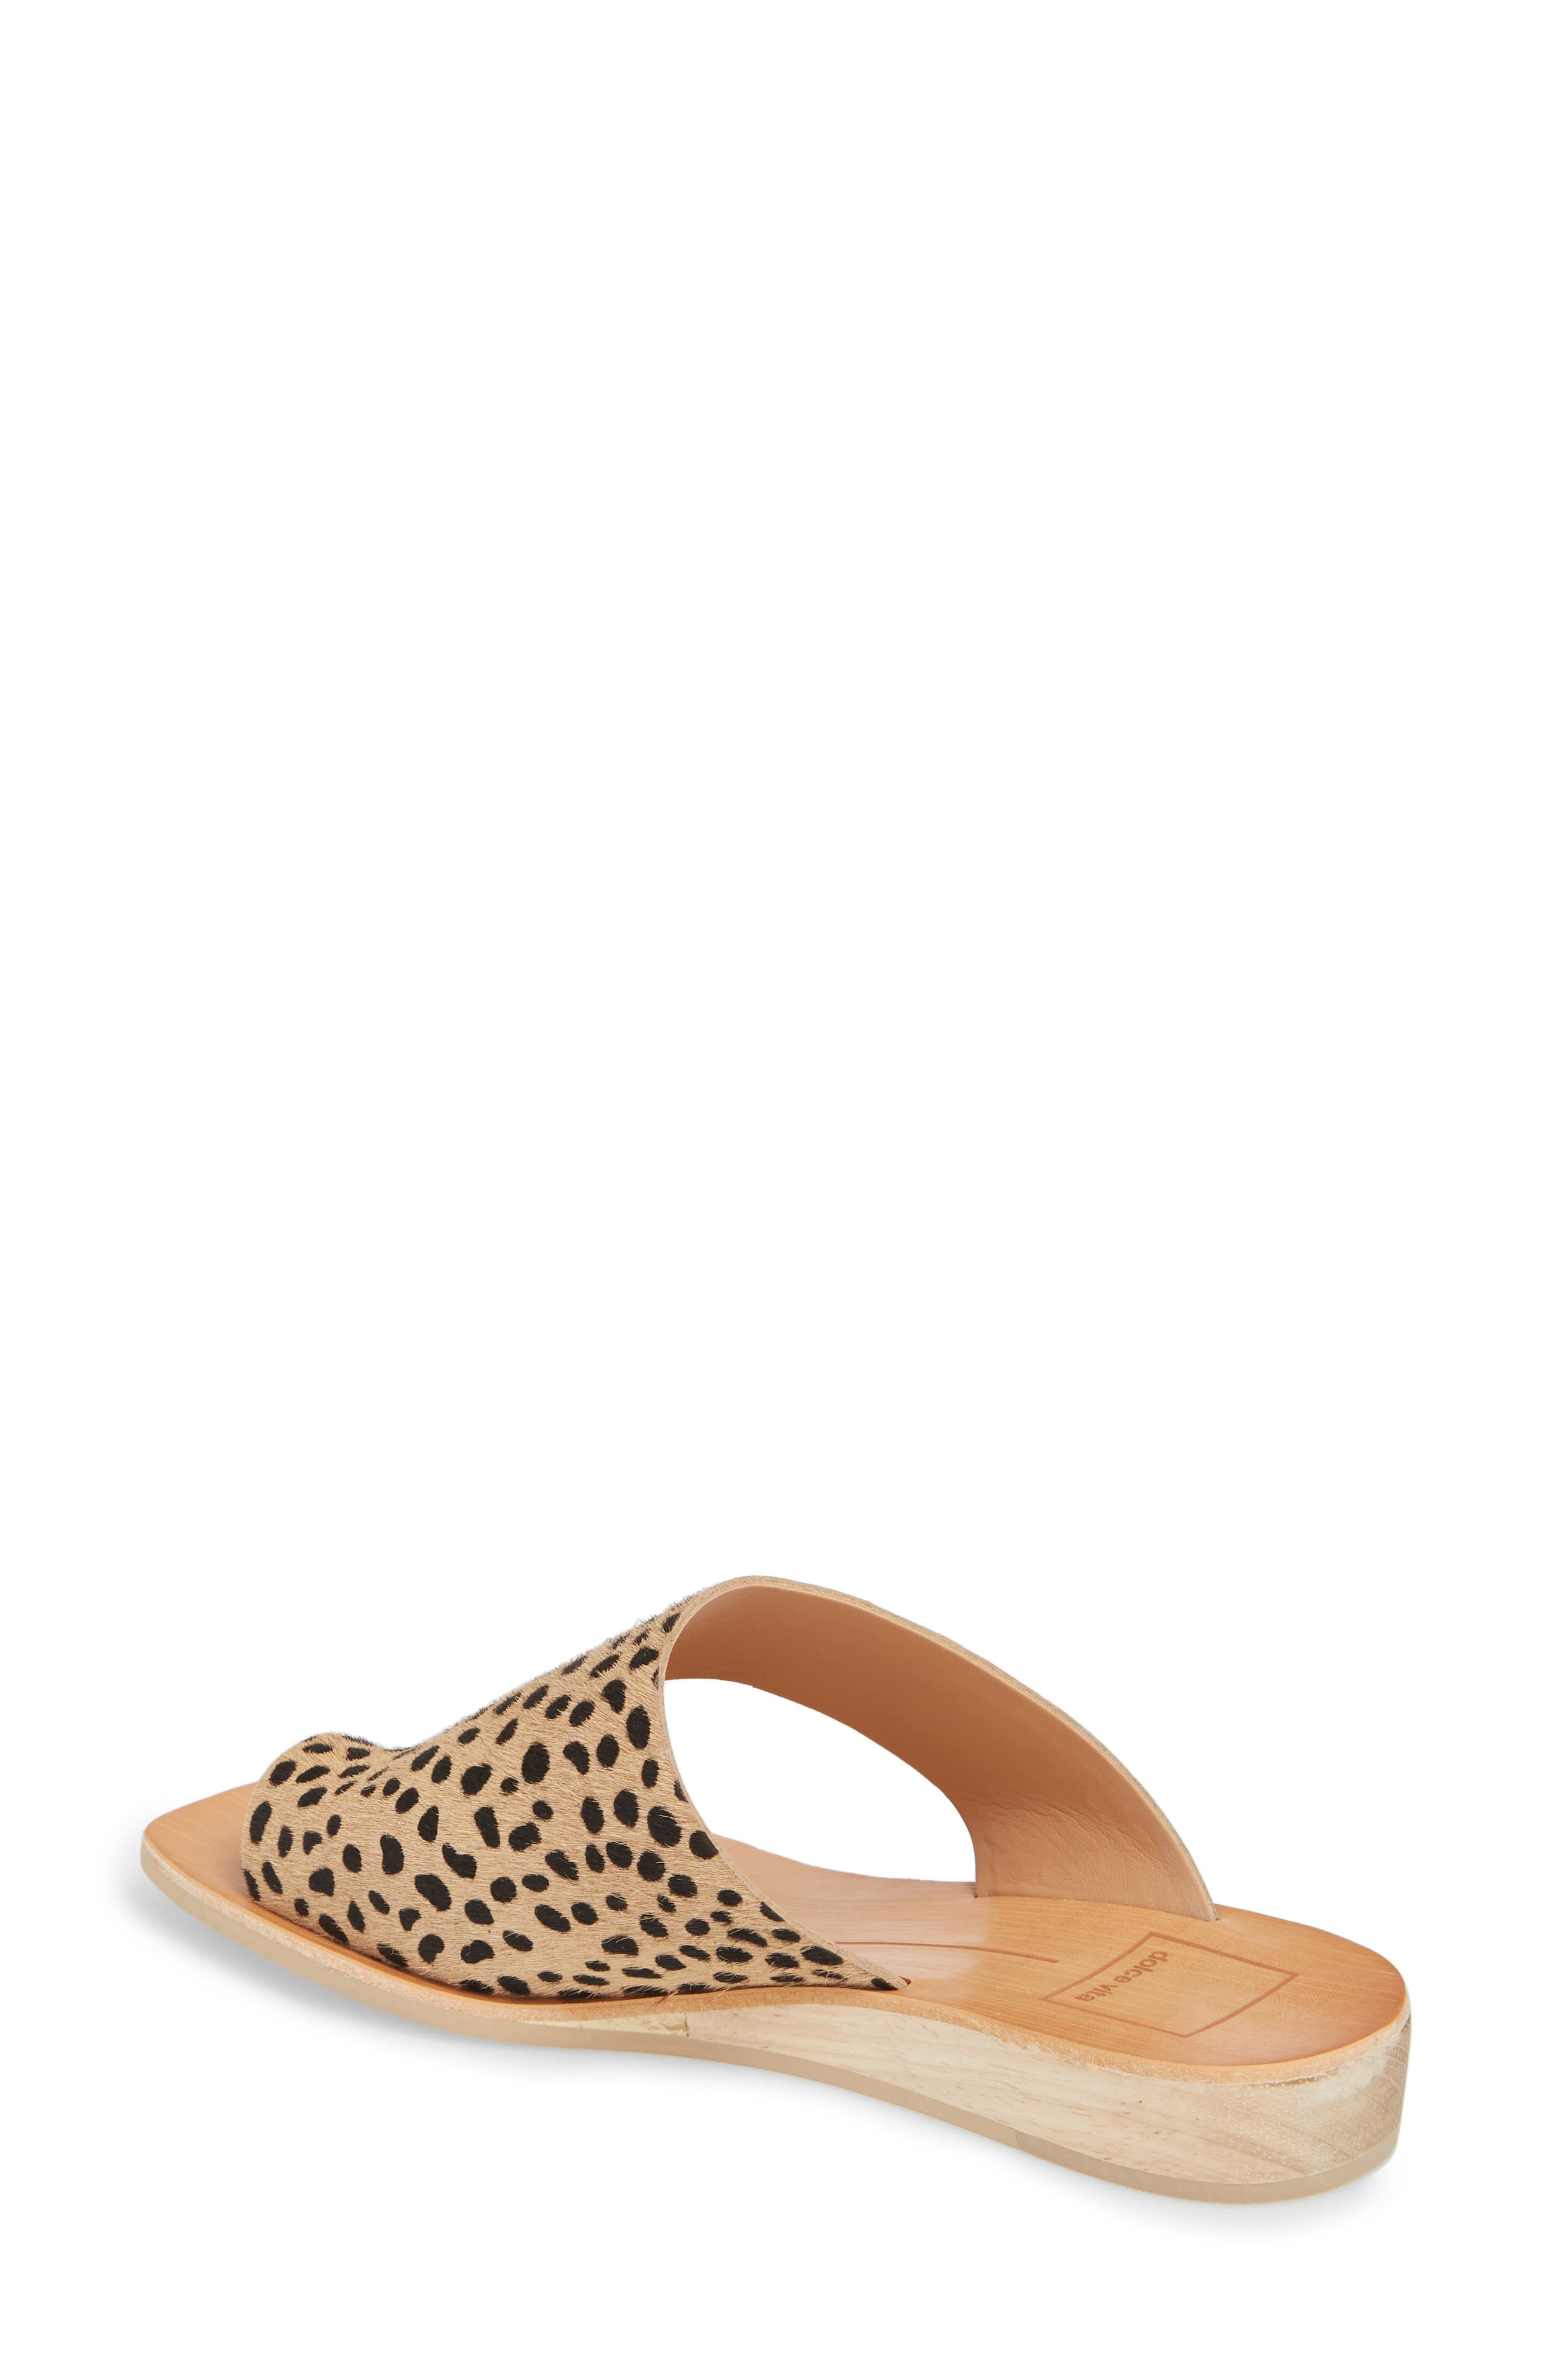 Hazle Asymmetrical Toe Loop Sandal,                             Alternate thumbnail 6, color,